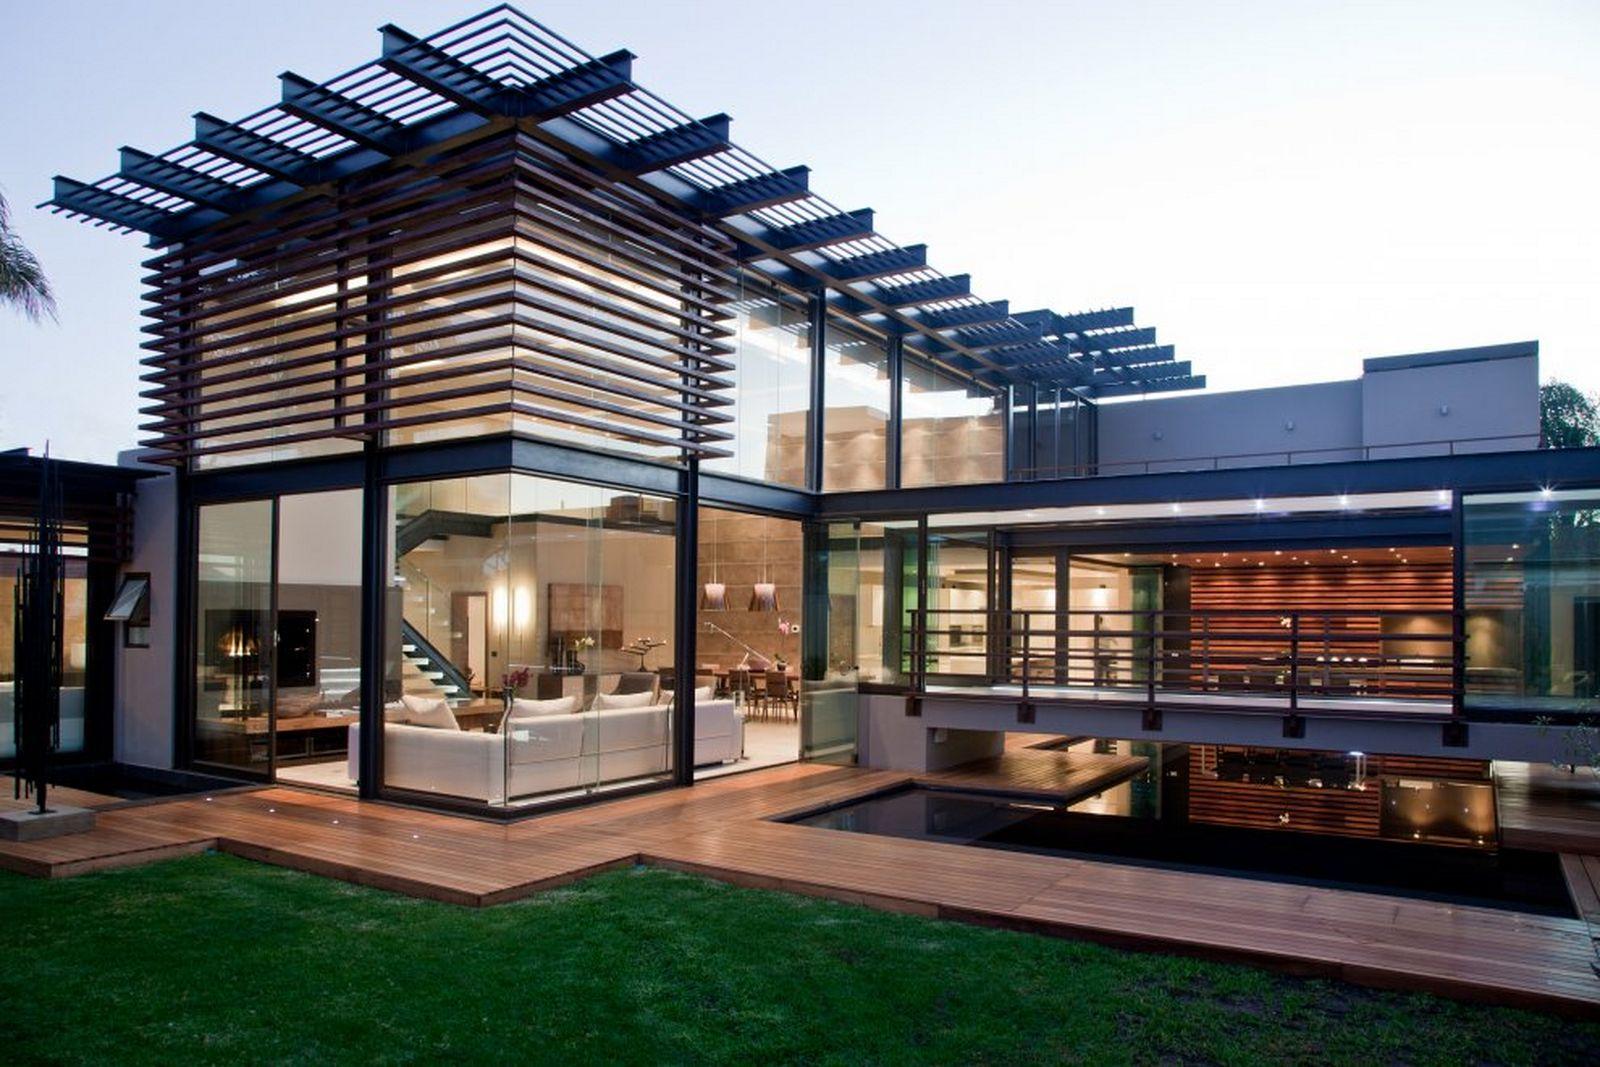 71 contemporary exterior design photos CCVTVWI